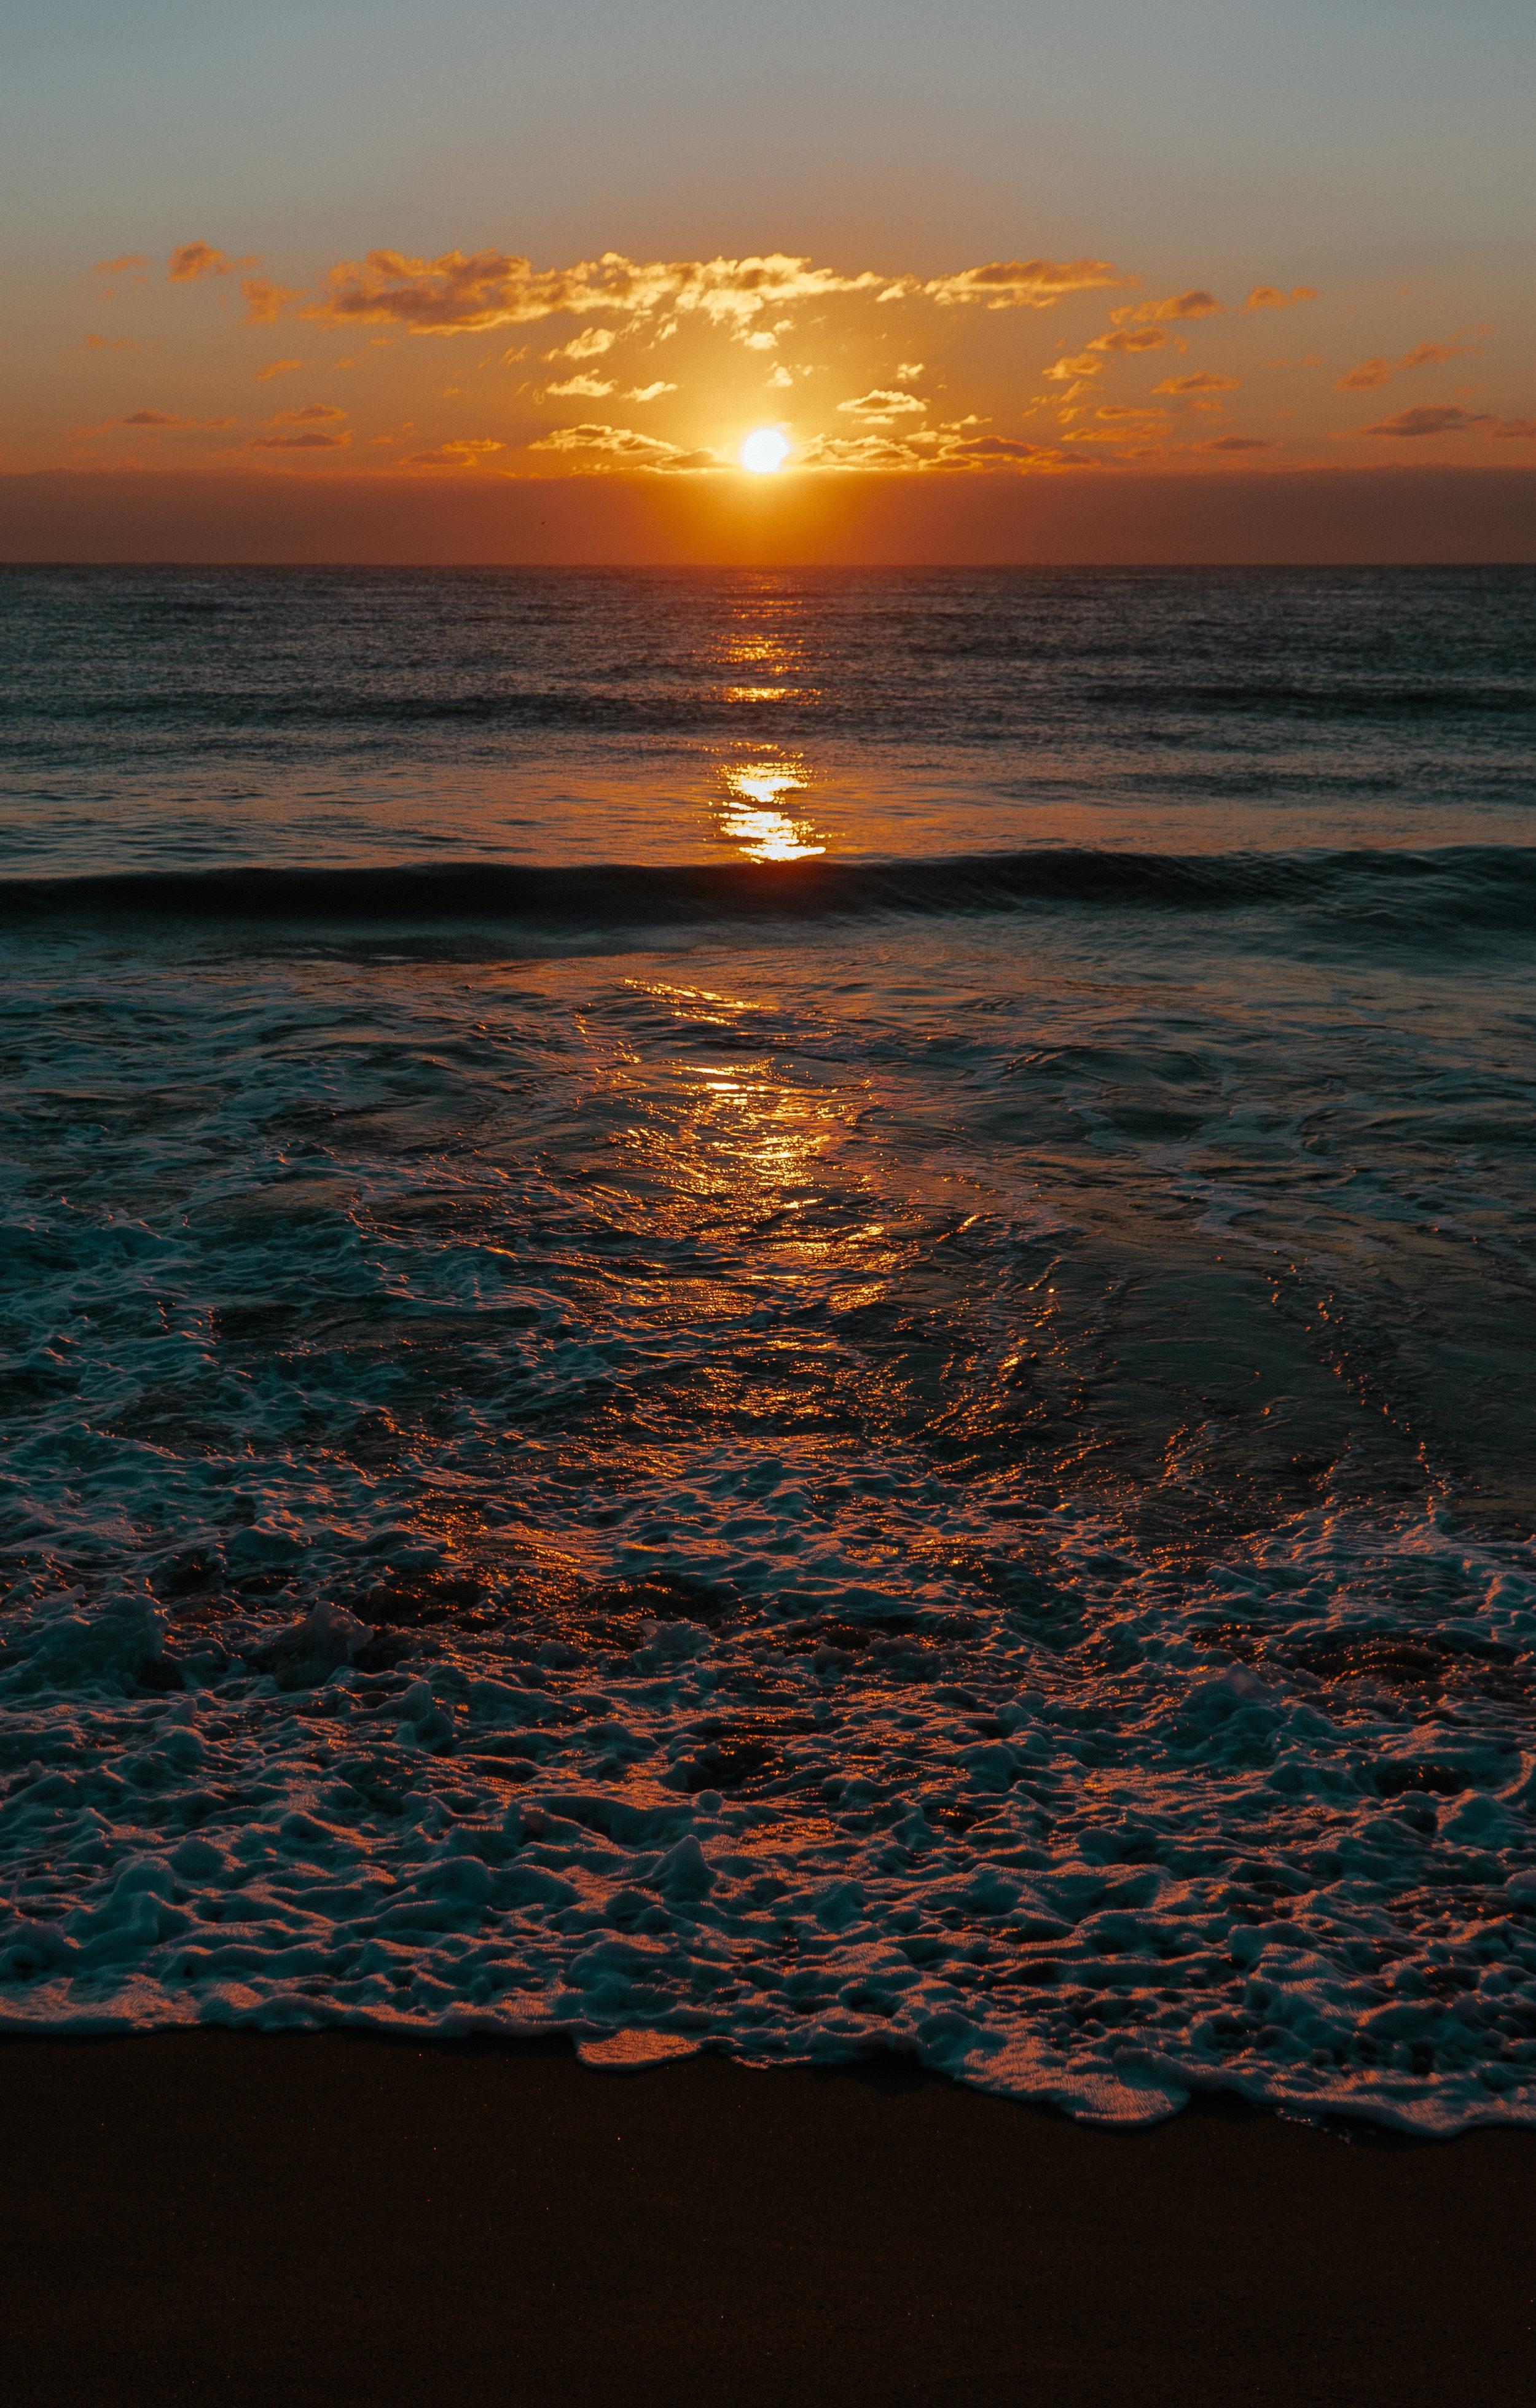 SunriseBarcelona03.jpg